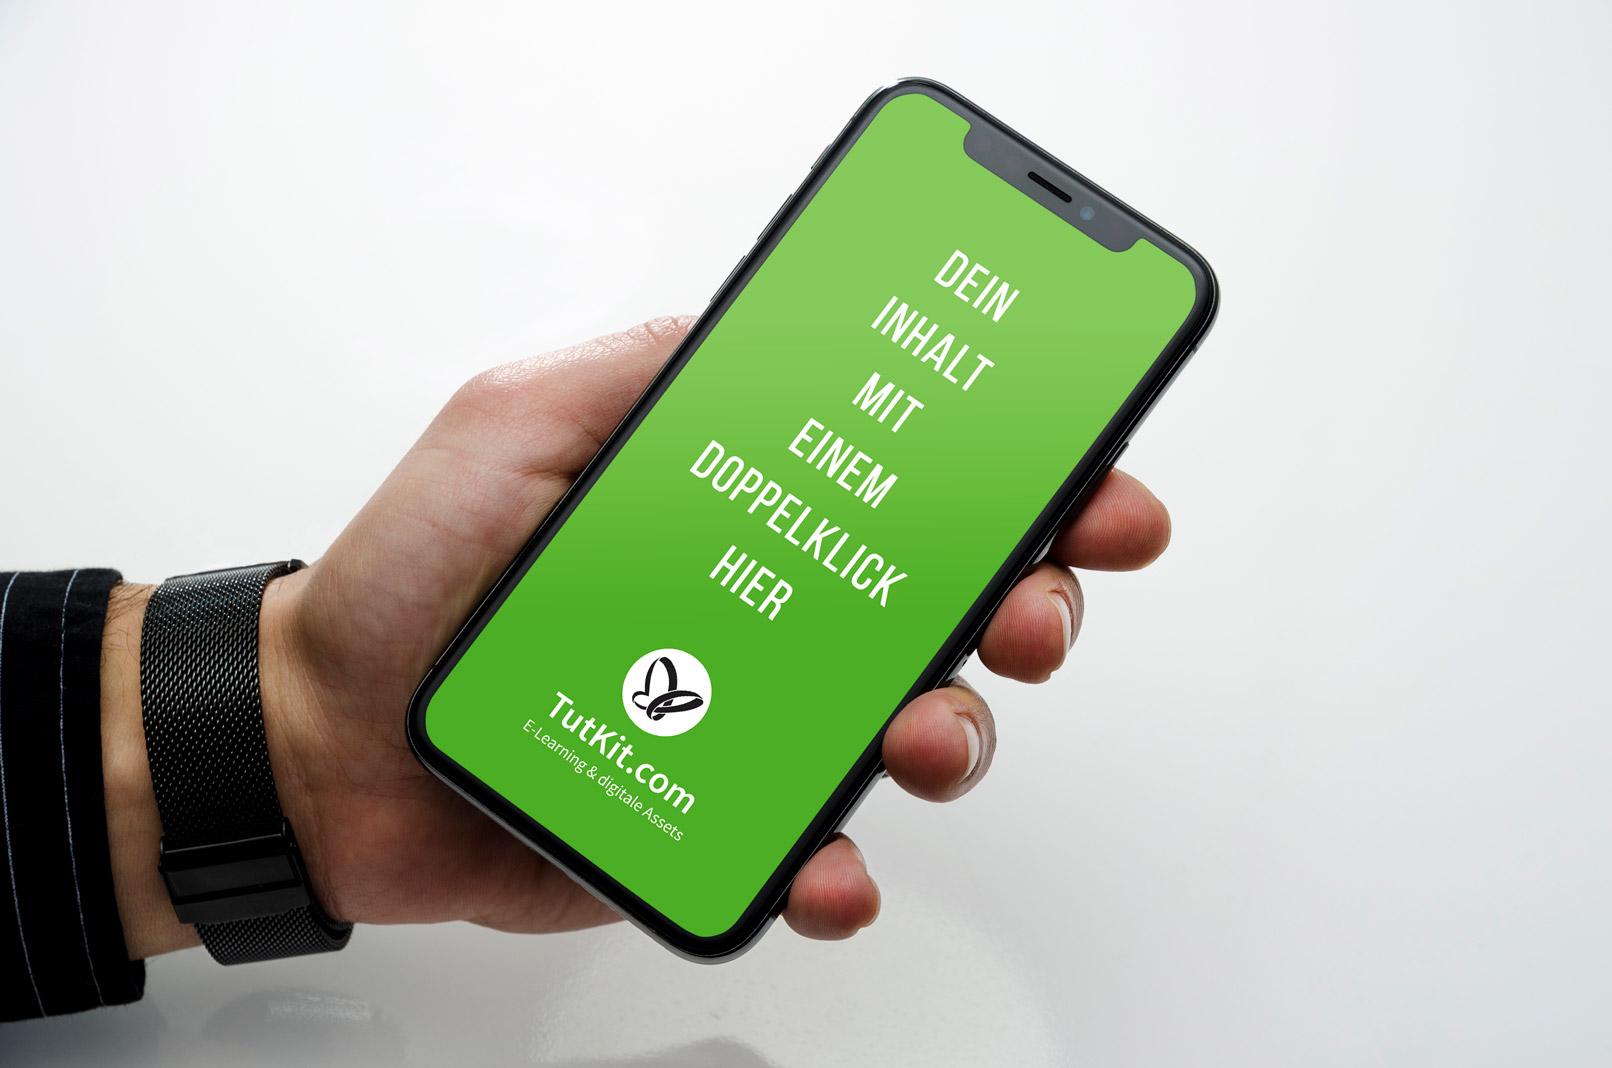 Mockup für Smartphone, Handy, iPhone X